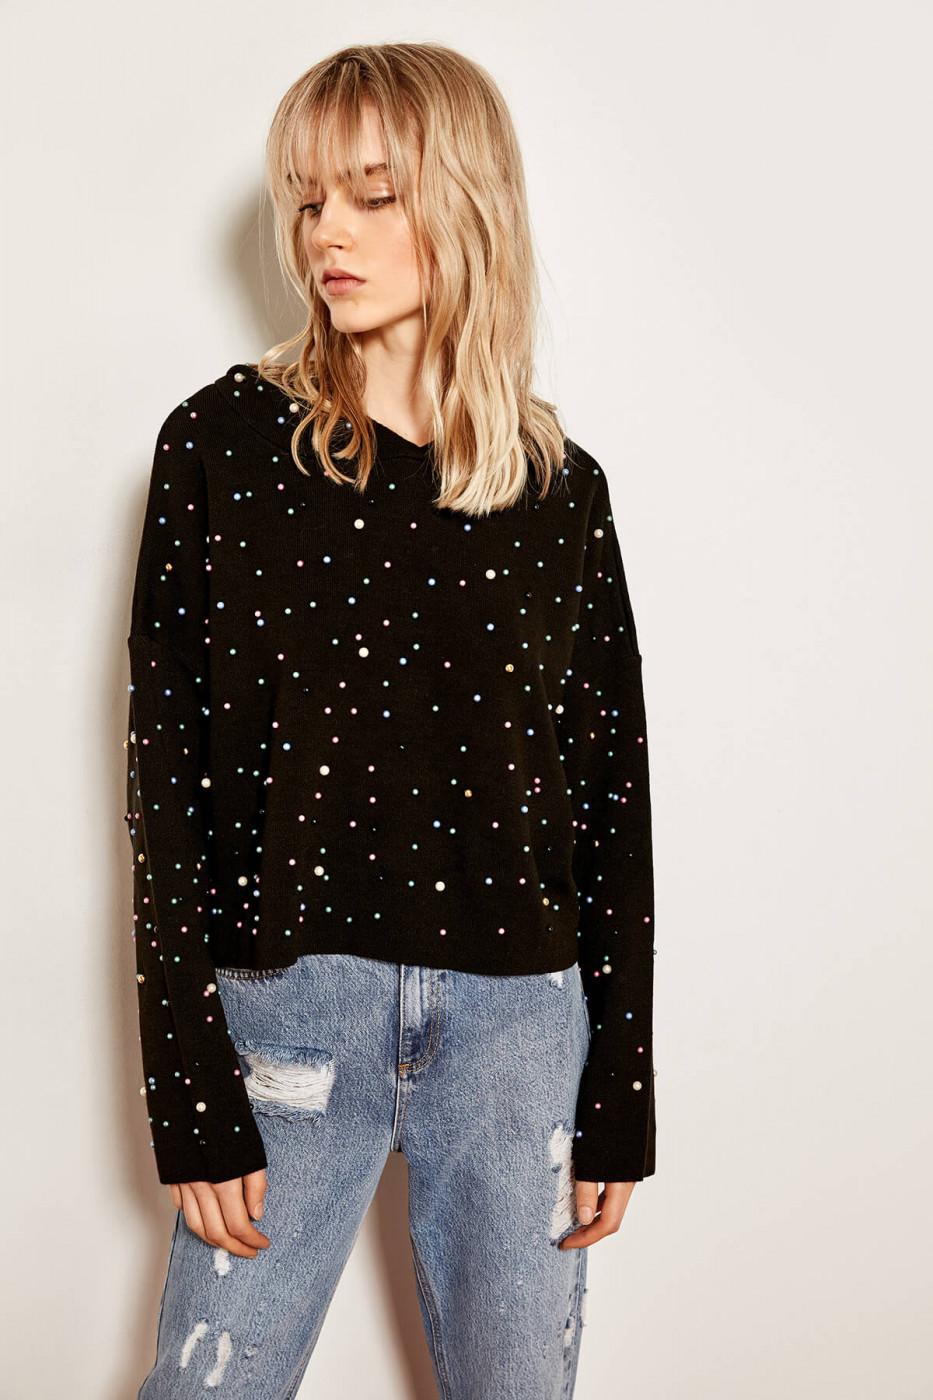 Trendyol Black Beaded Sweater